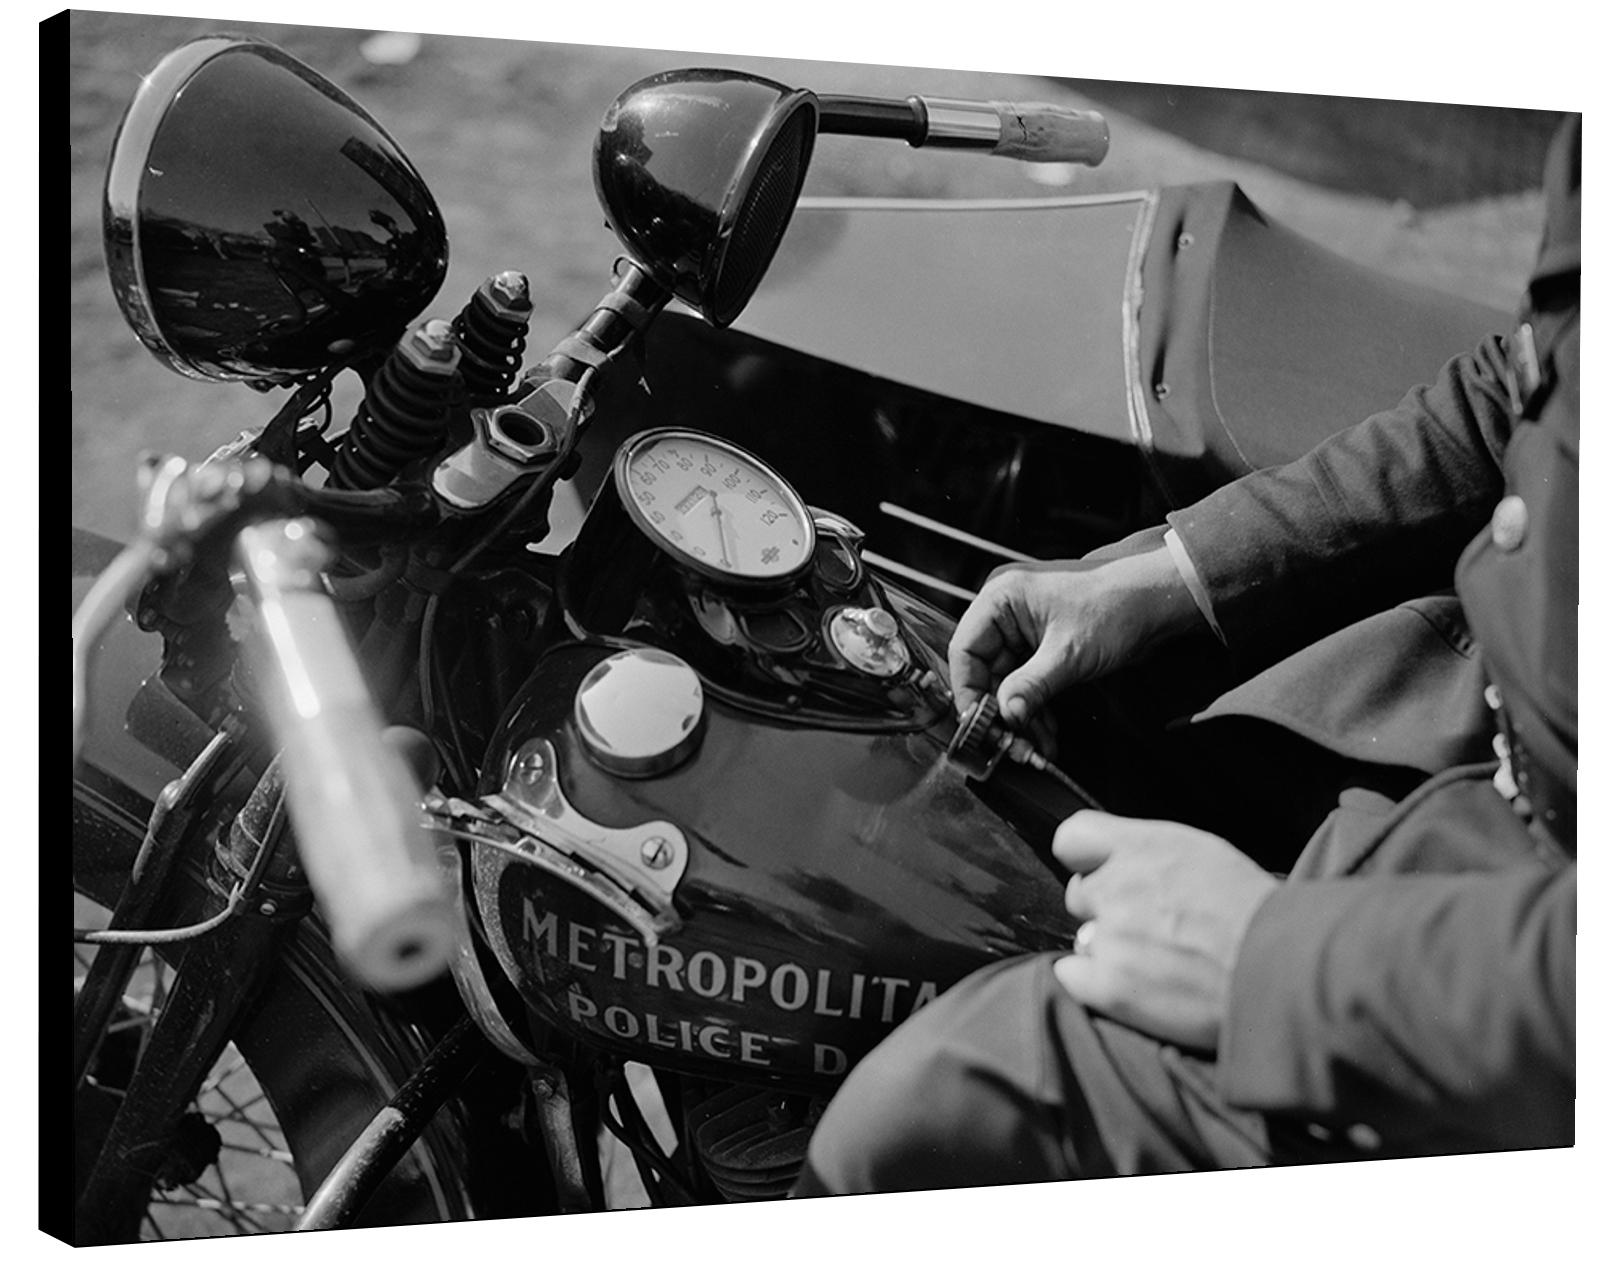 Photo sur toile - Harley Davidson Police 1938